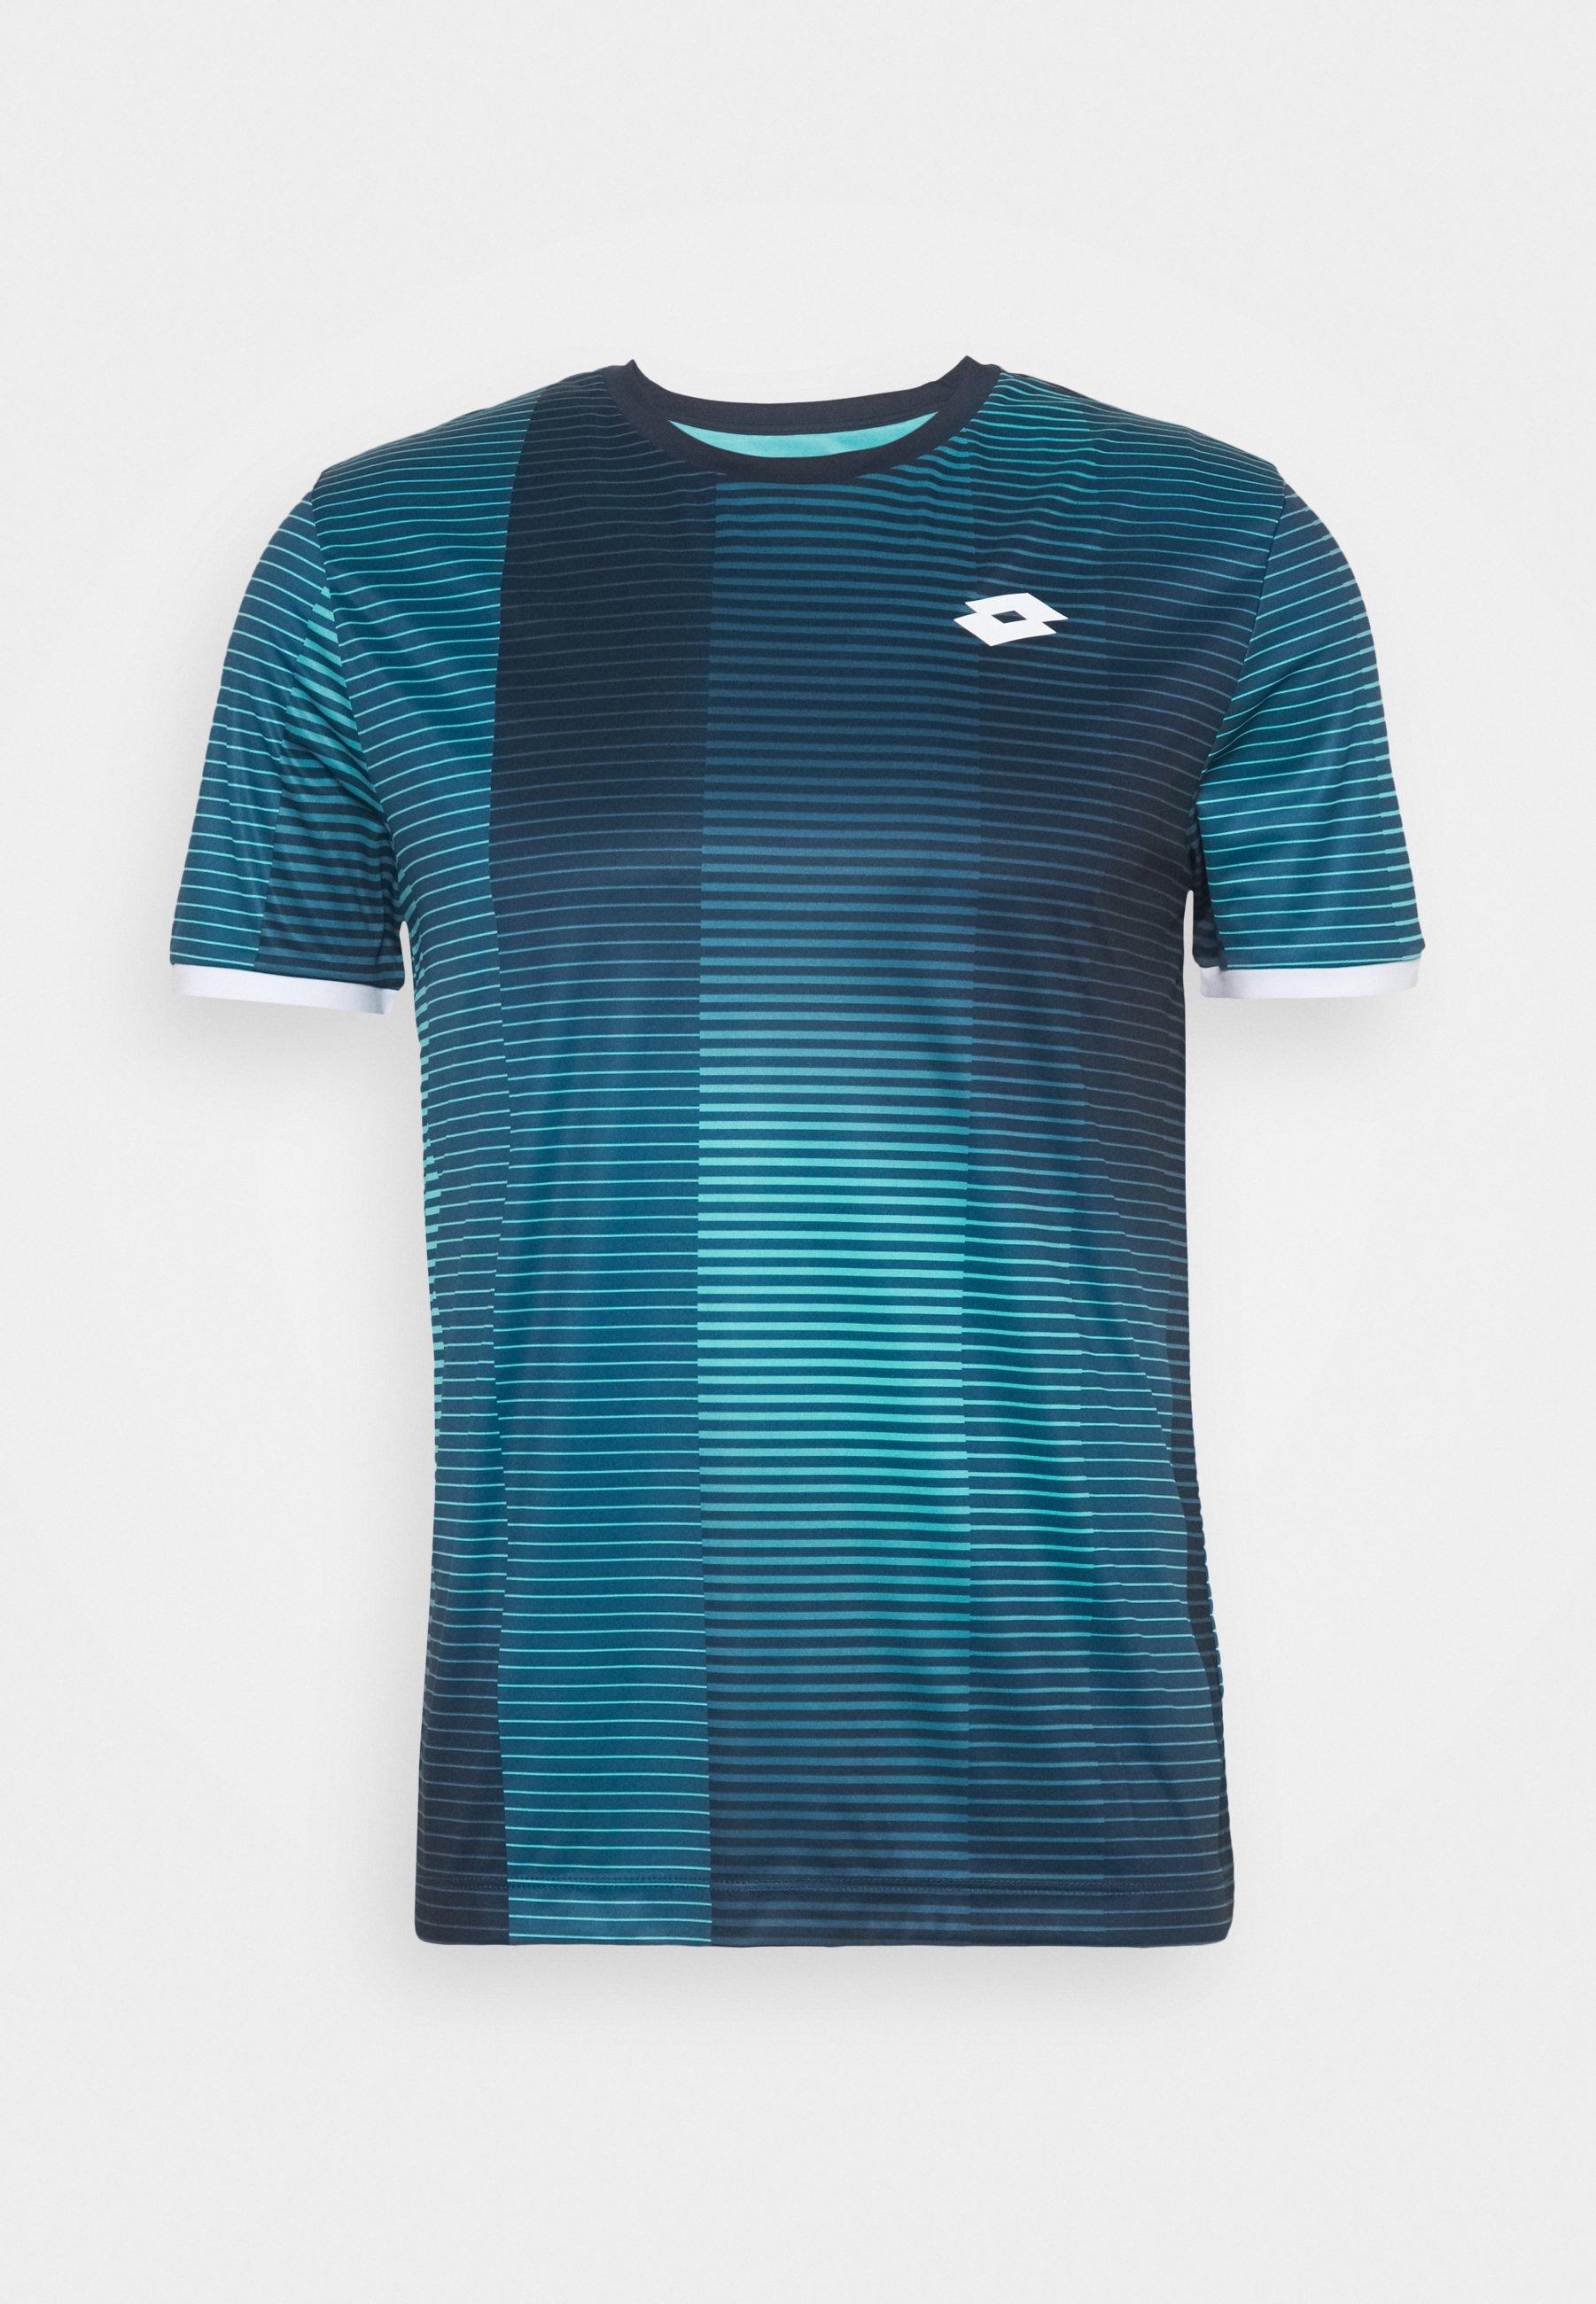 Herren T Shirt adidas Parley Printed Tee NavyBlue | Sportega.at